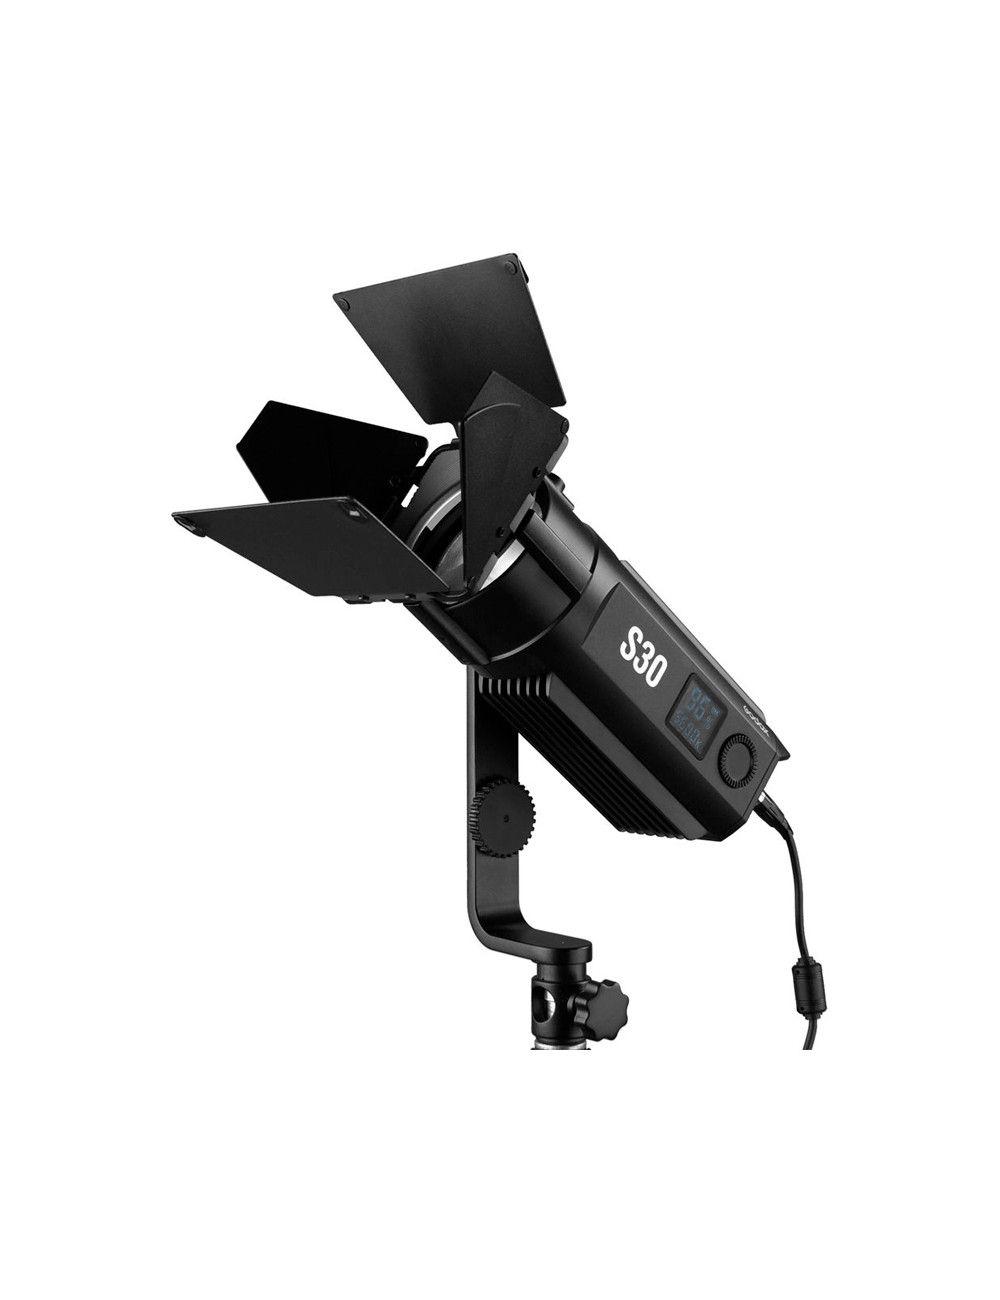 Yongnuo RF605N KIT 2 Radiotransceptores 605 Para Nikon Con Alcance de 100 Metros